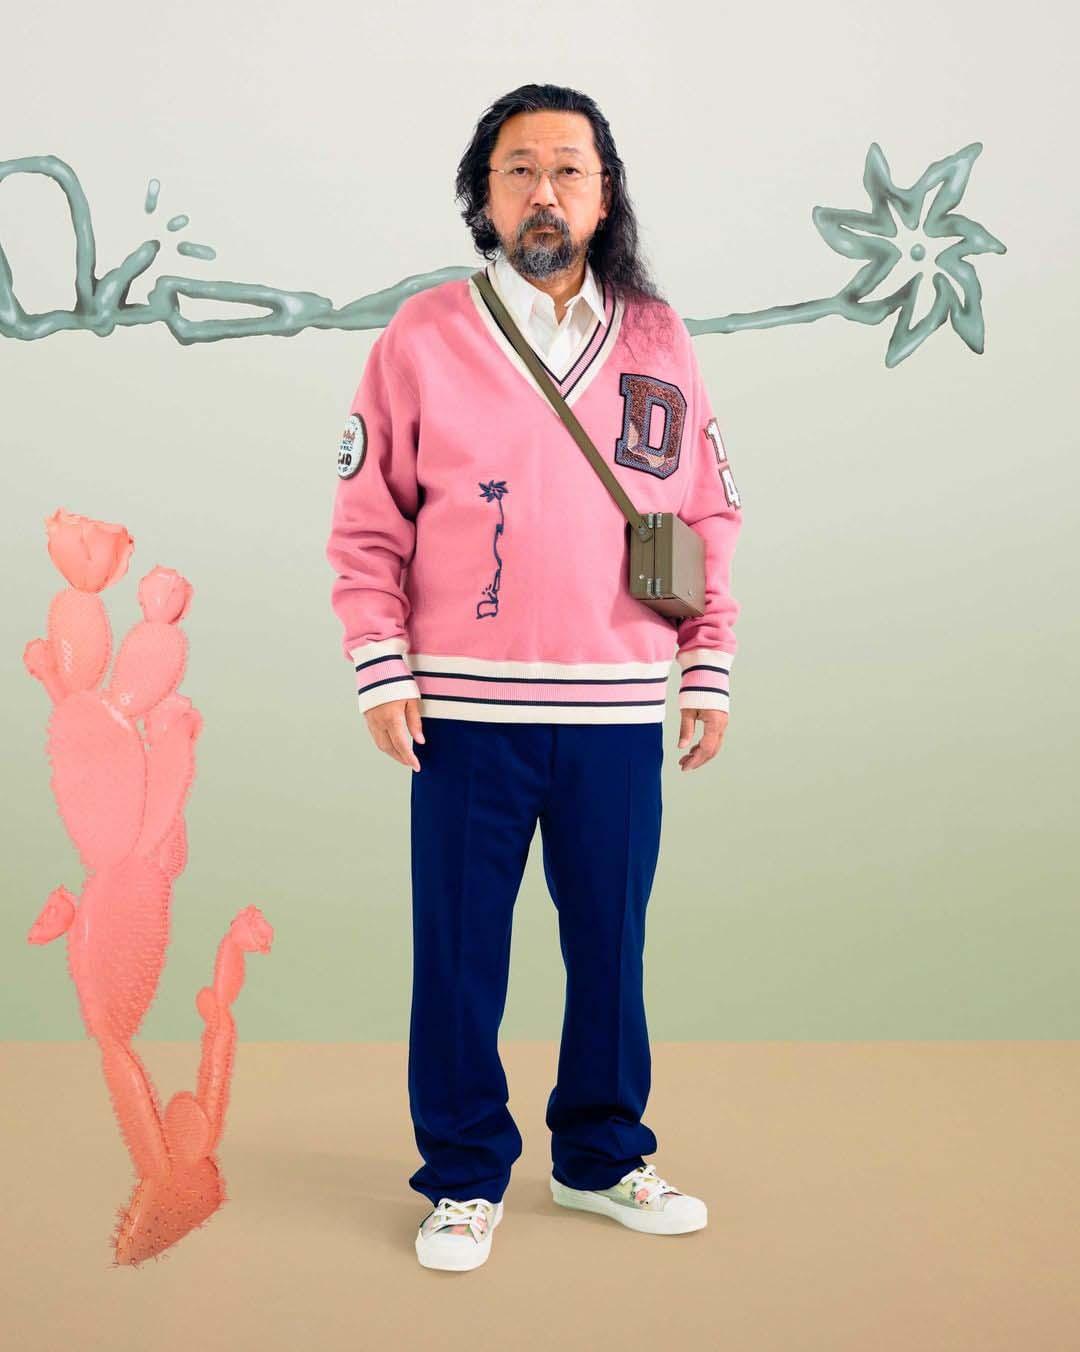 takashi murakami dior x Cactus Jack show